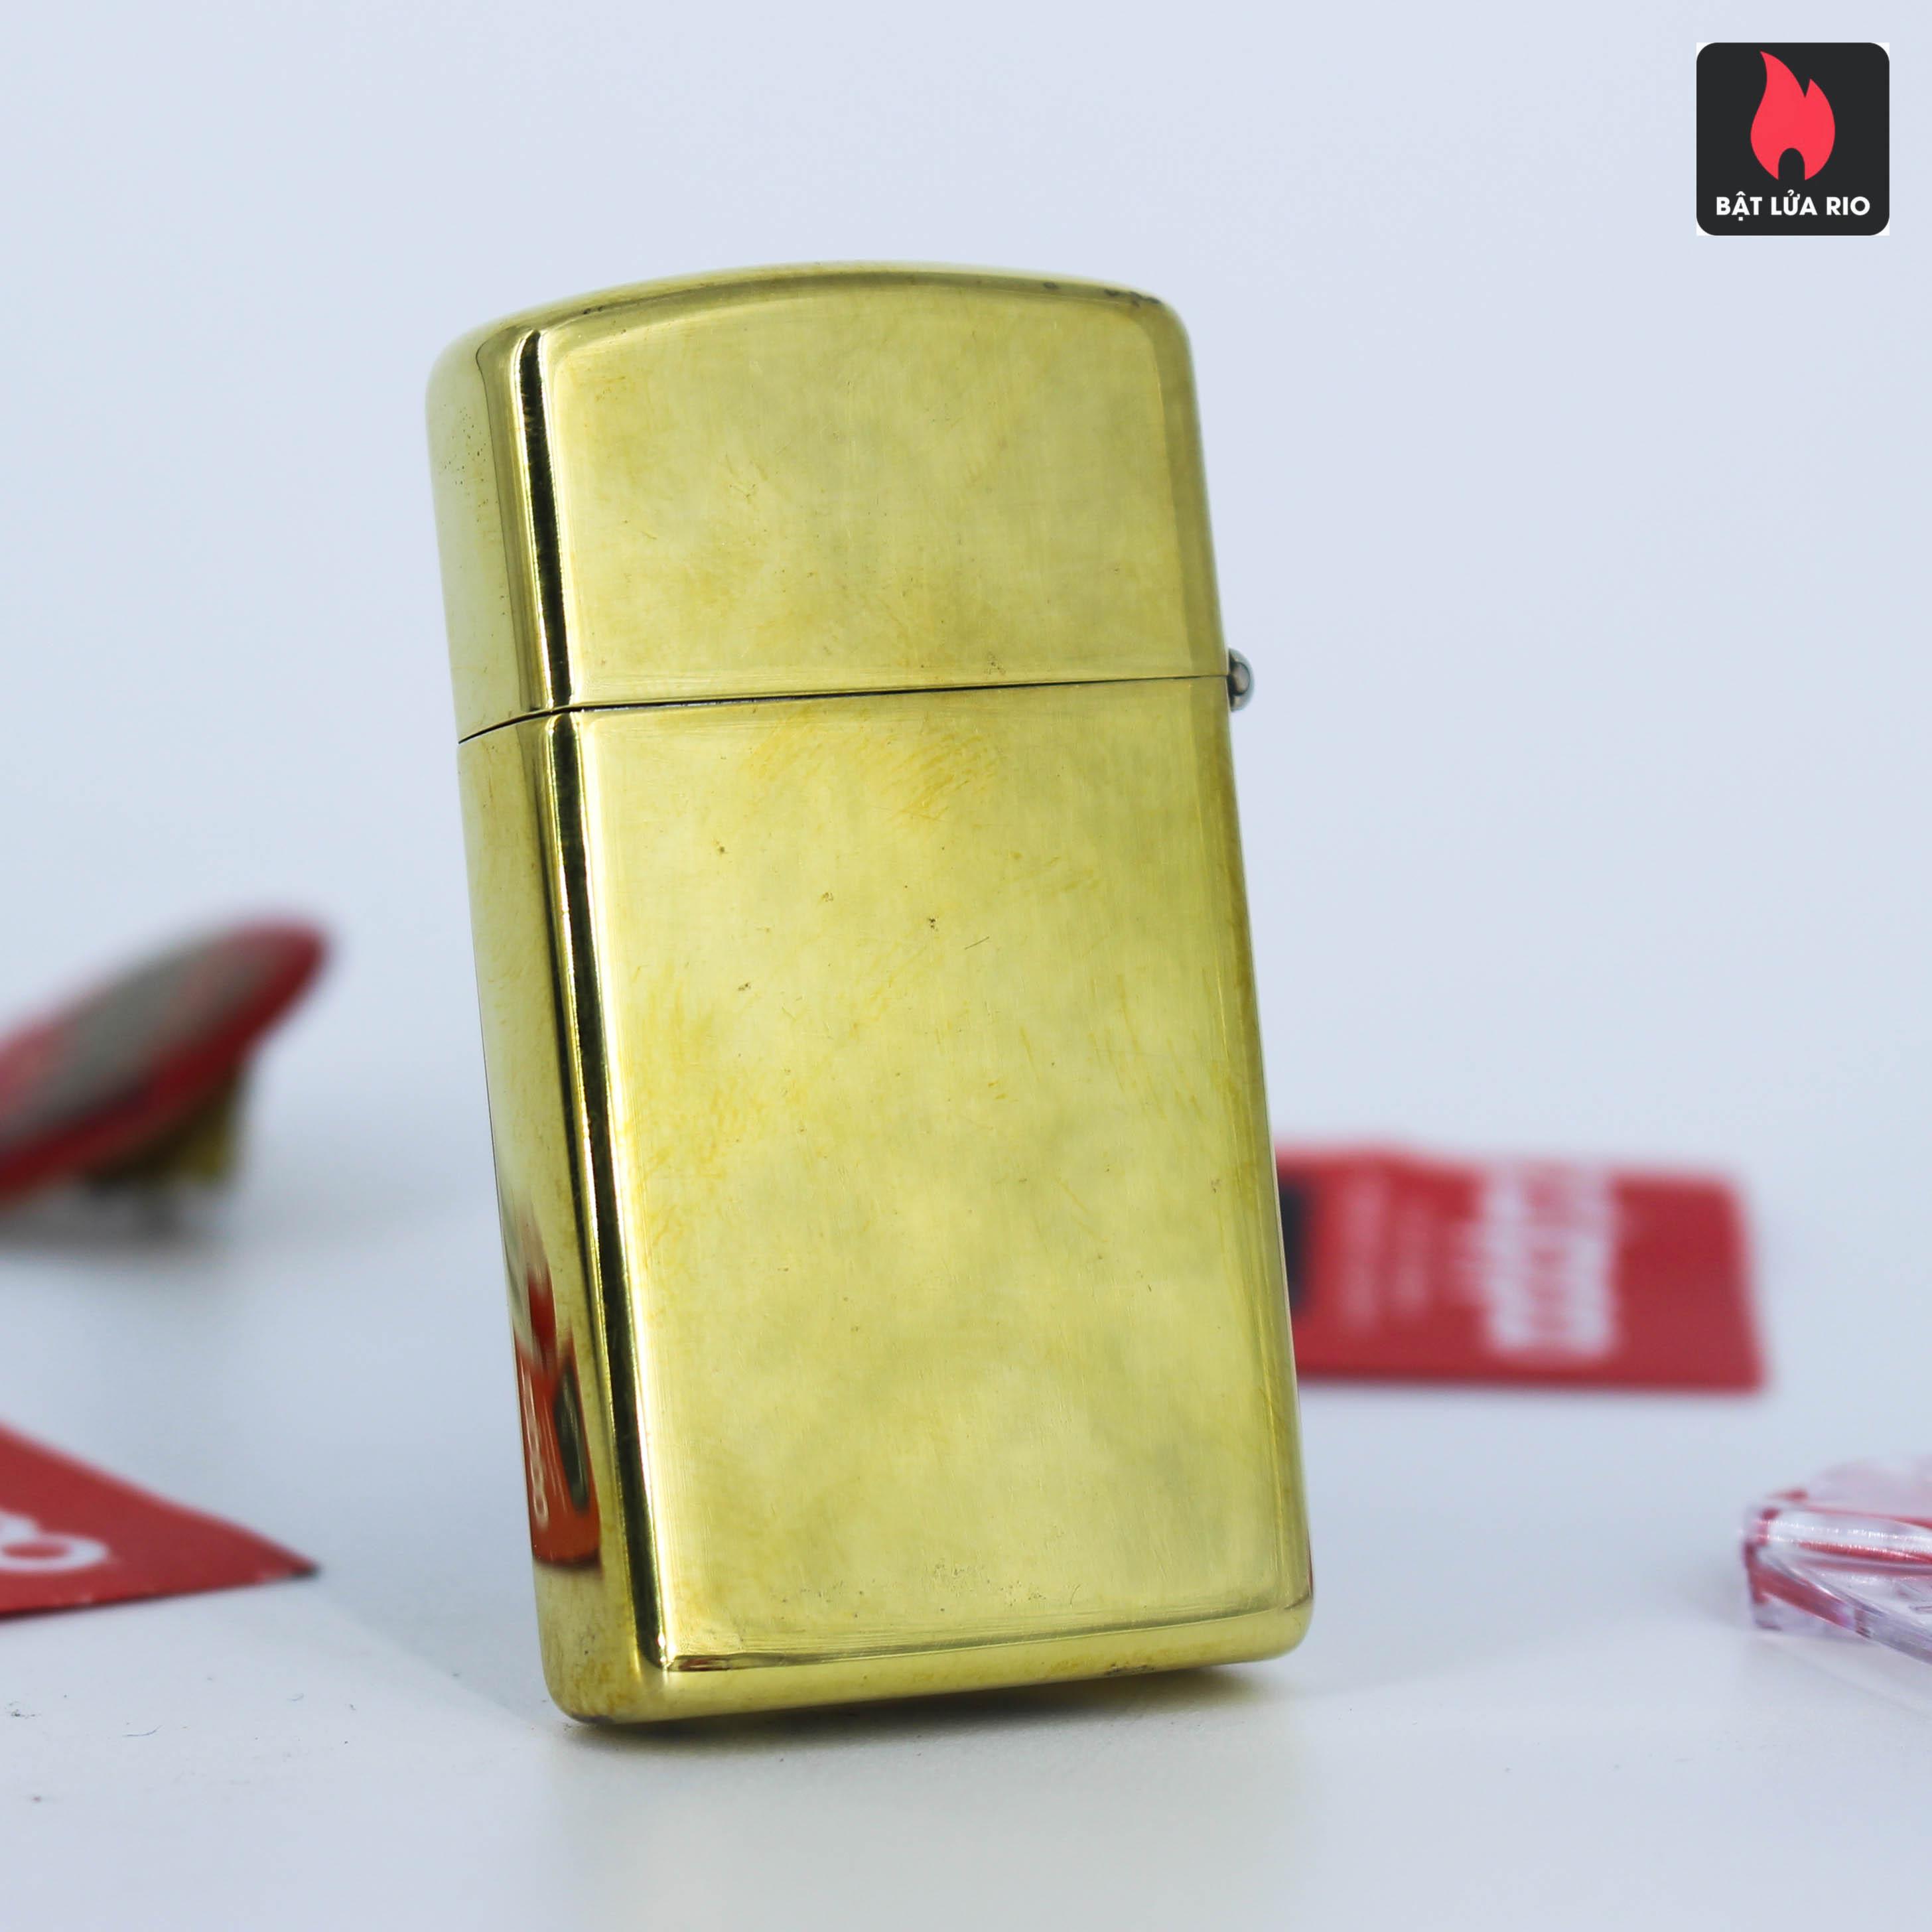 Zippo Slim 1980 - Solid Brass - Elegance 5